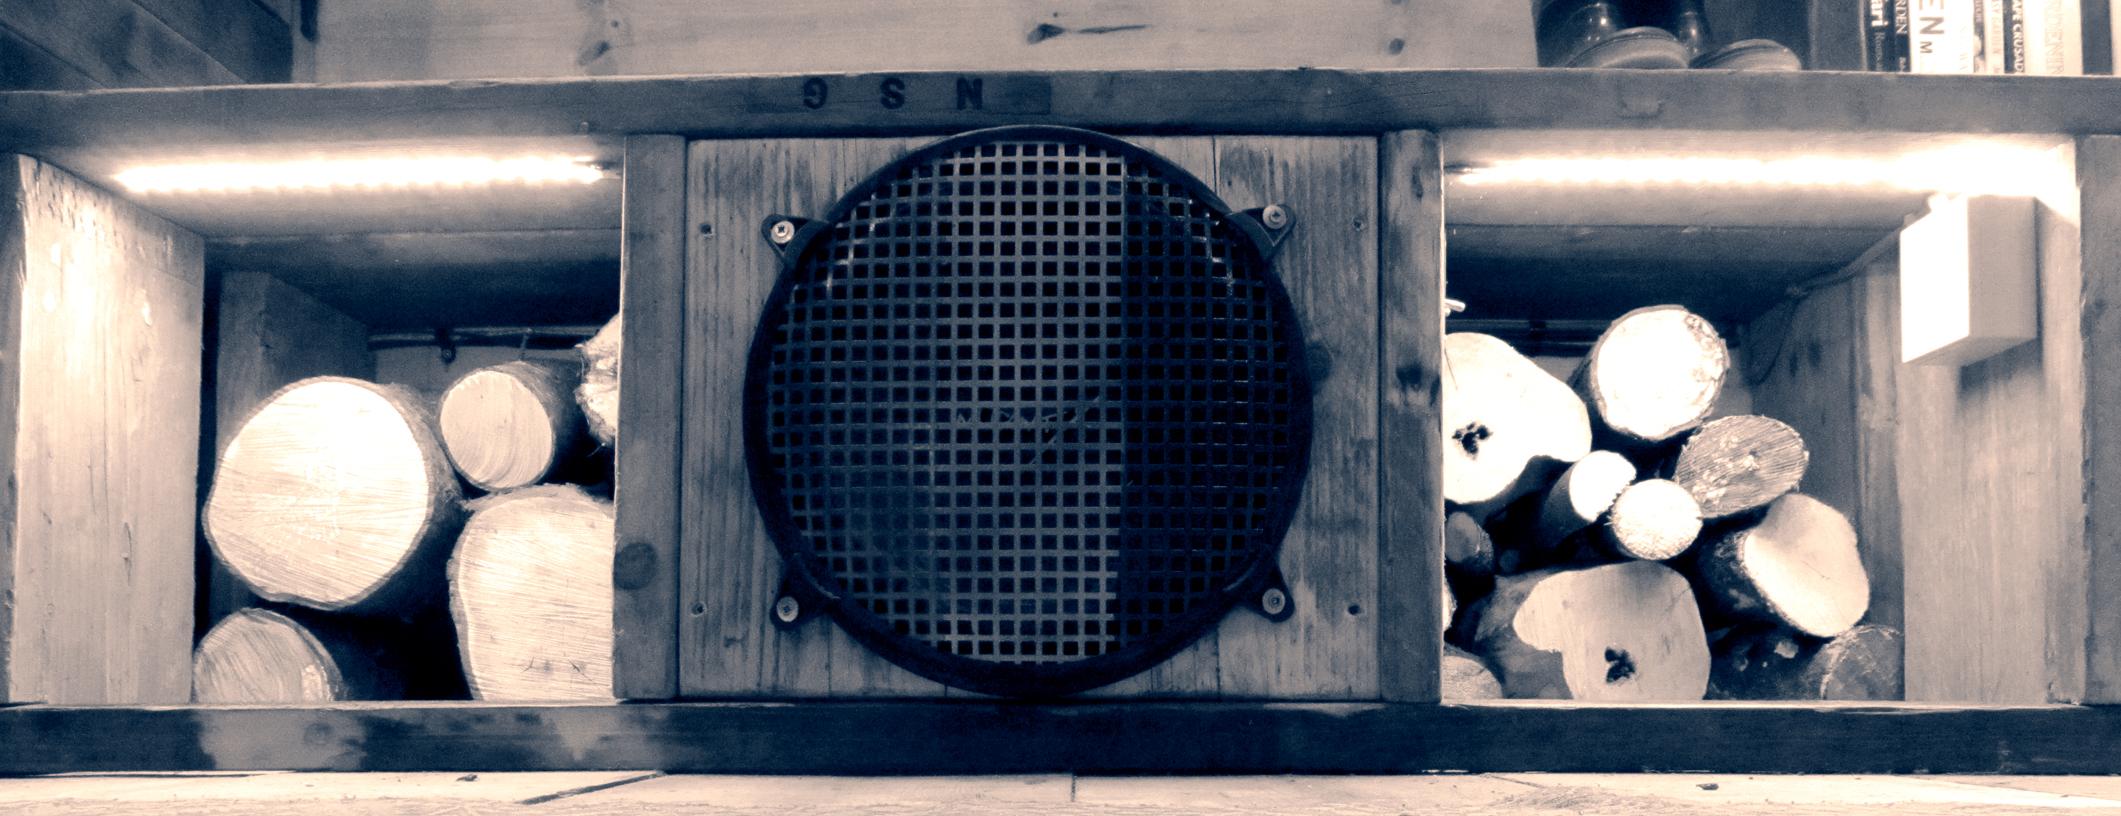 speakerlogs.jpg